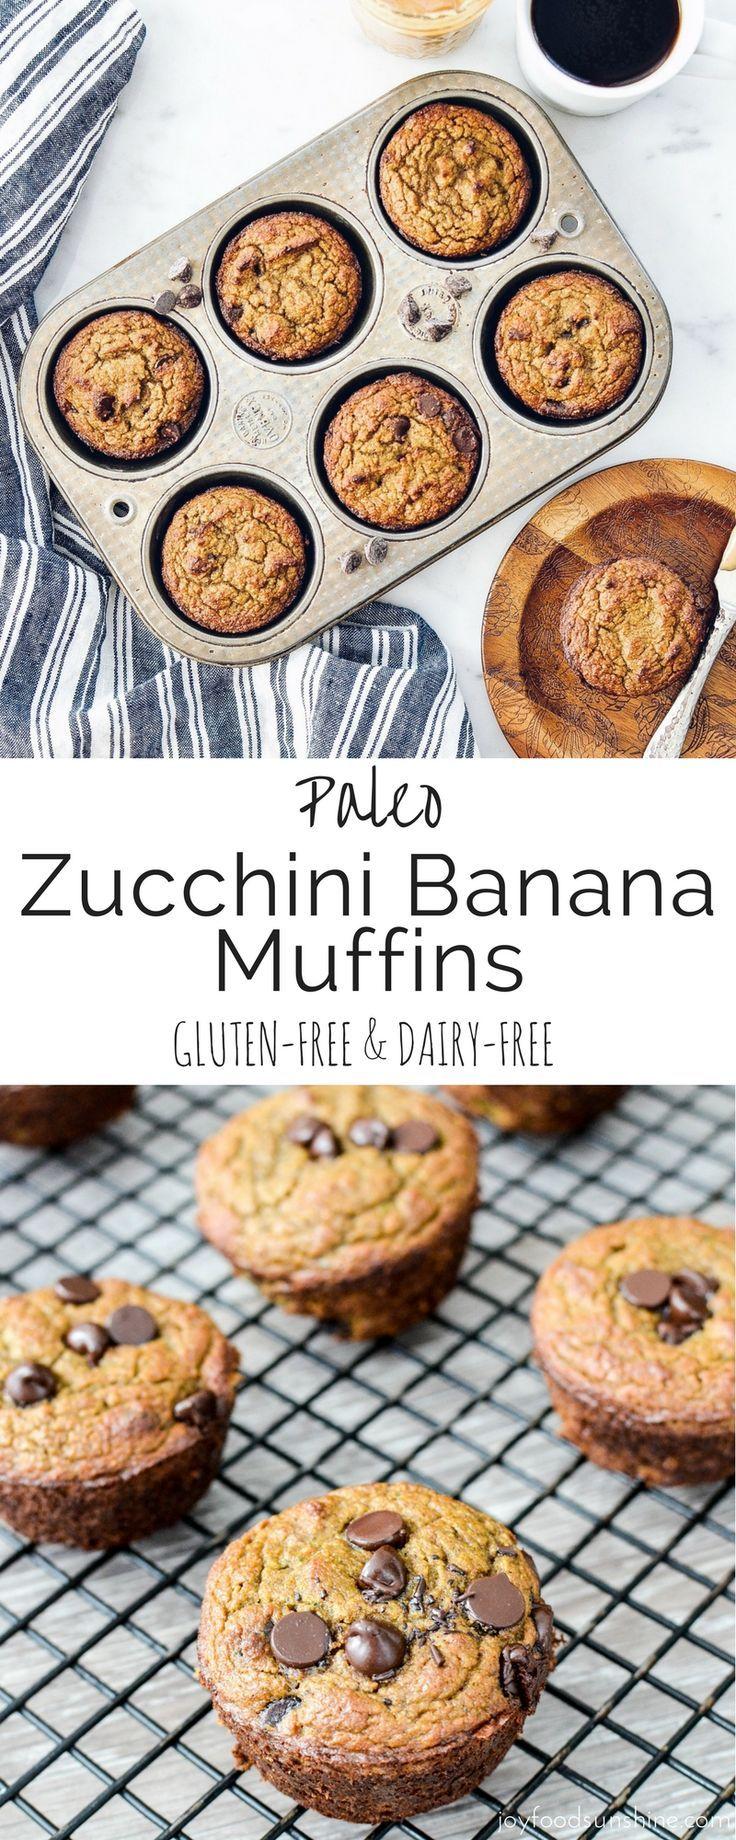 Paleo Zucchini Banana Muffins! The perfect healthy breakfast